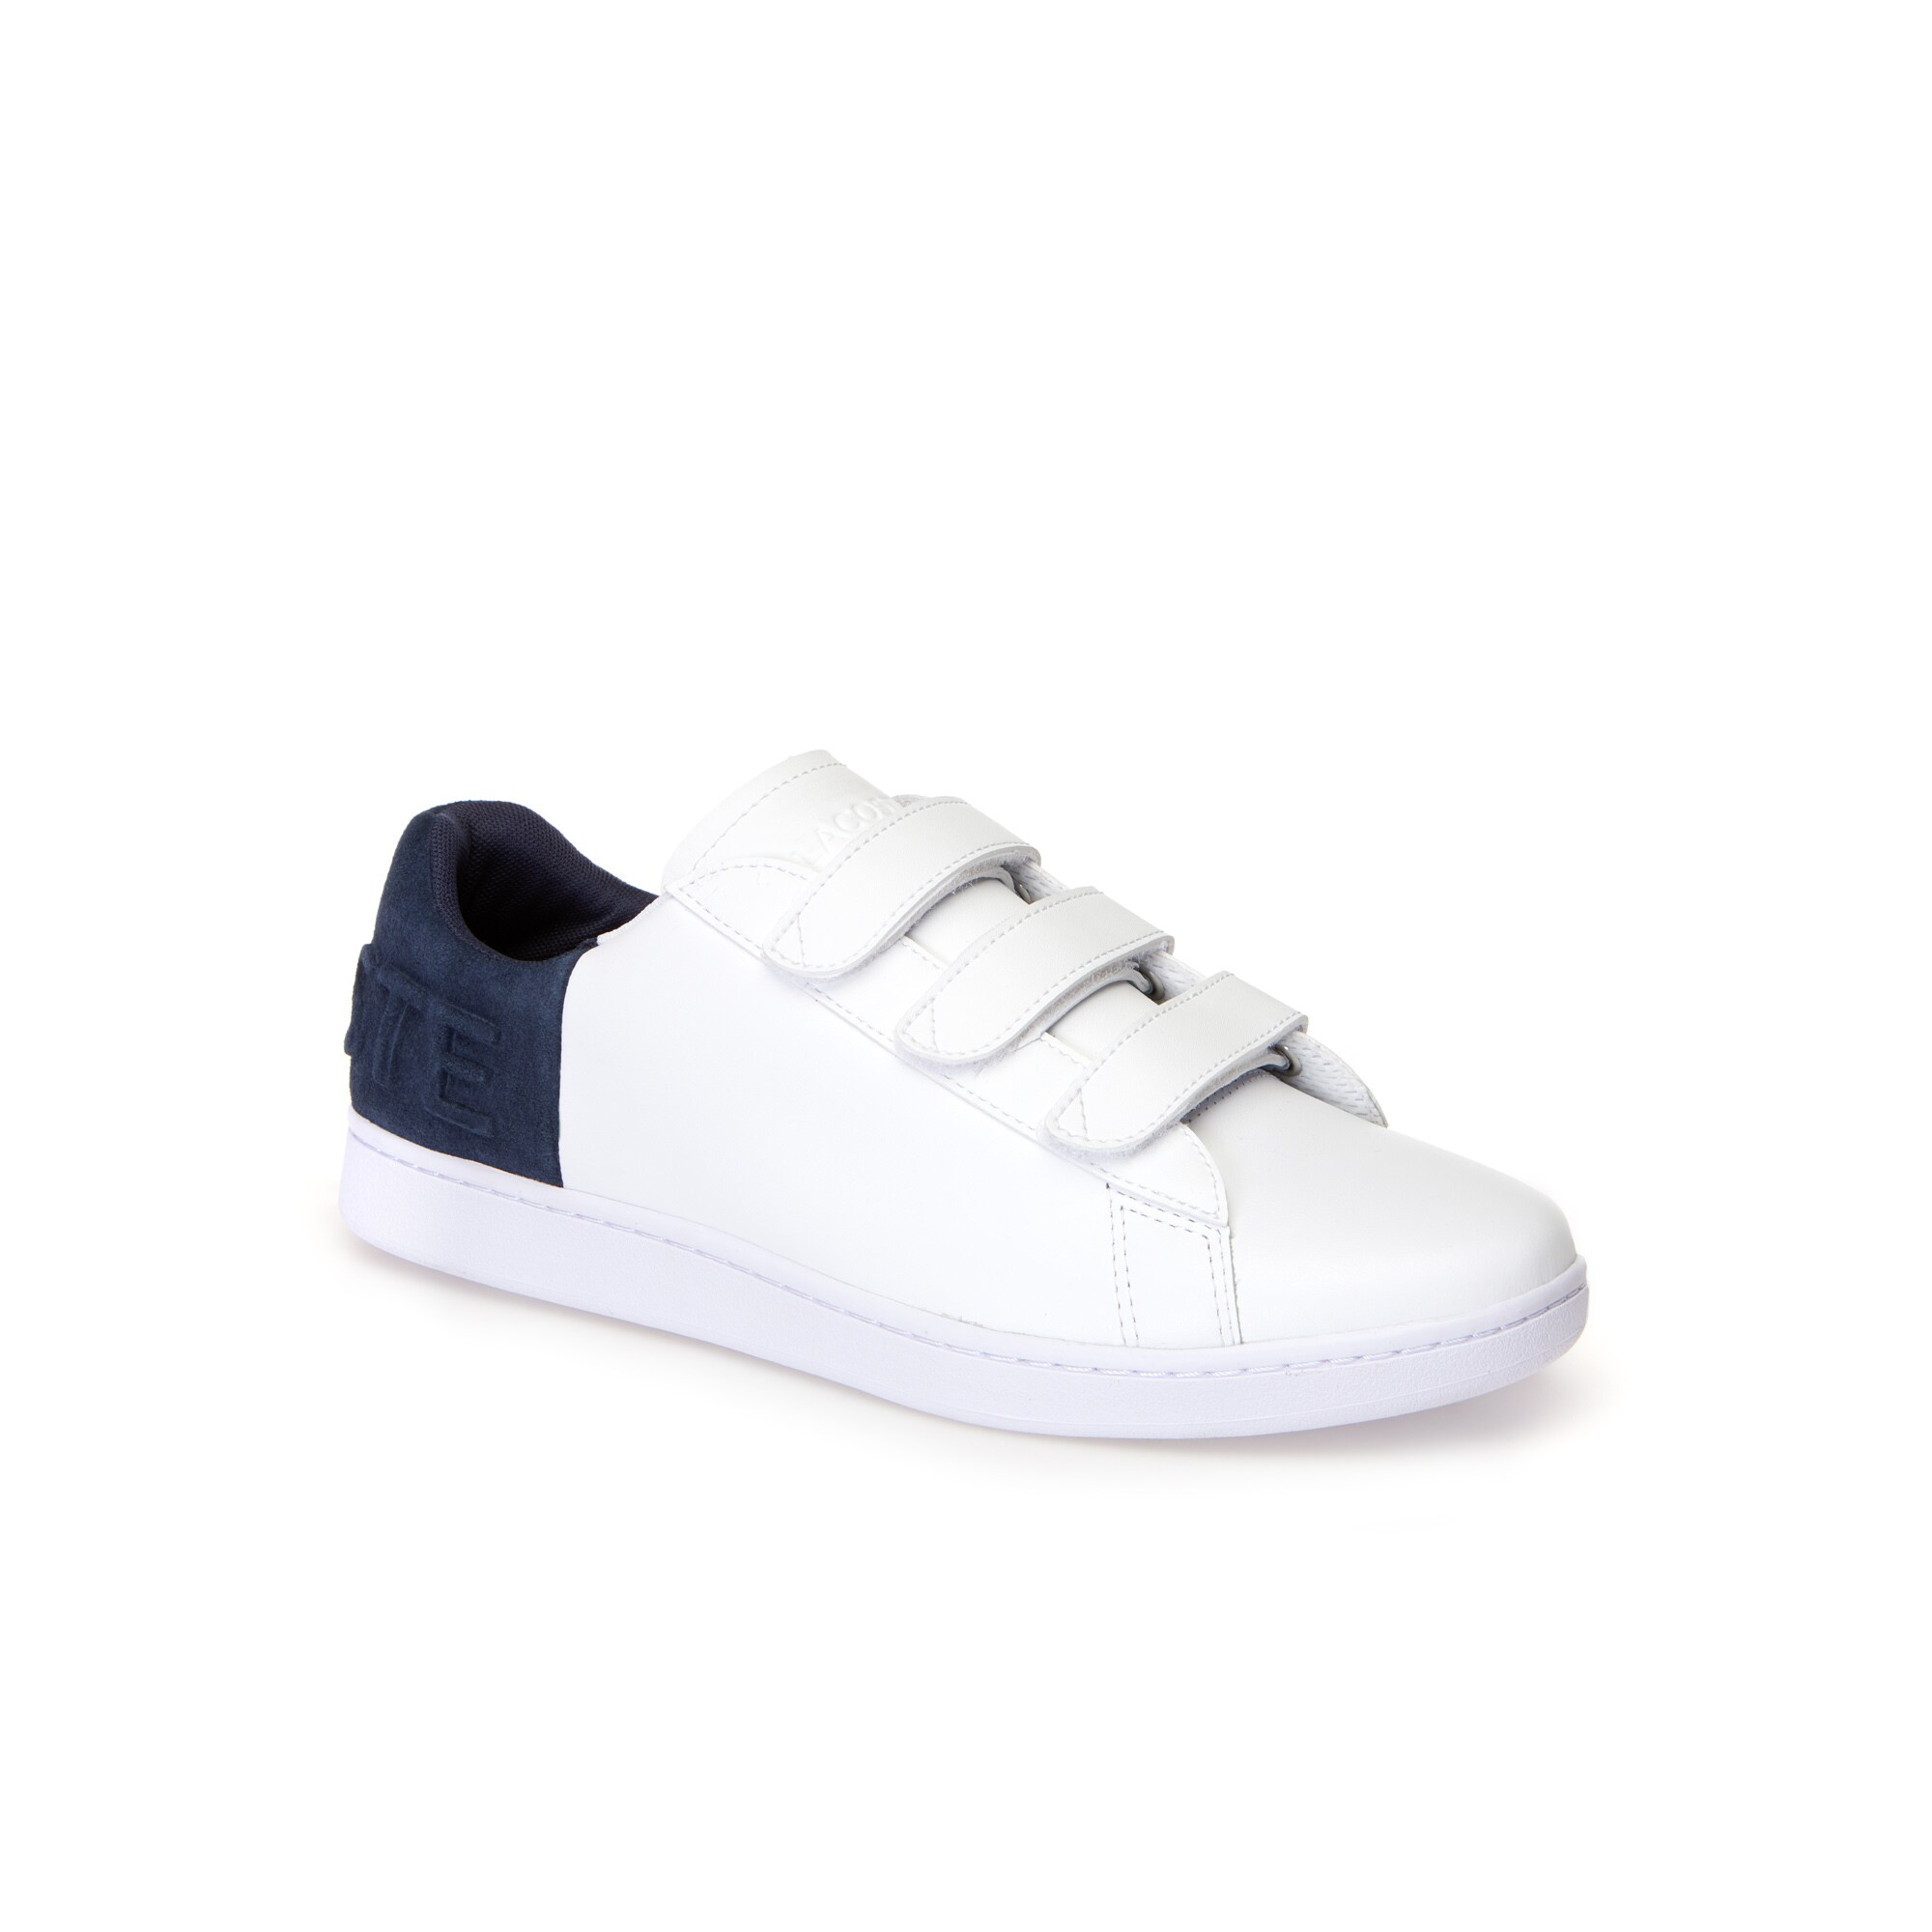 Herren Strap Sneakers CARNABY EVO aus Leder und Veloursleder